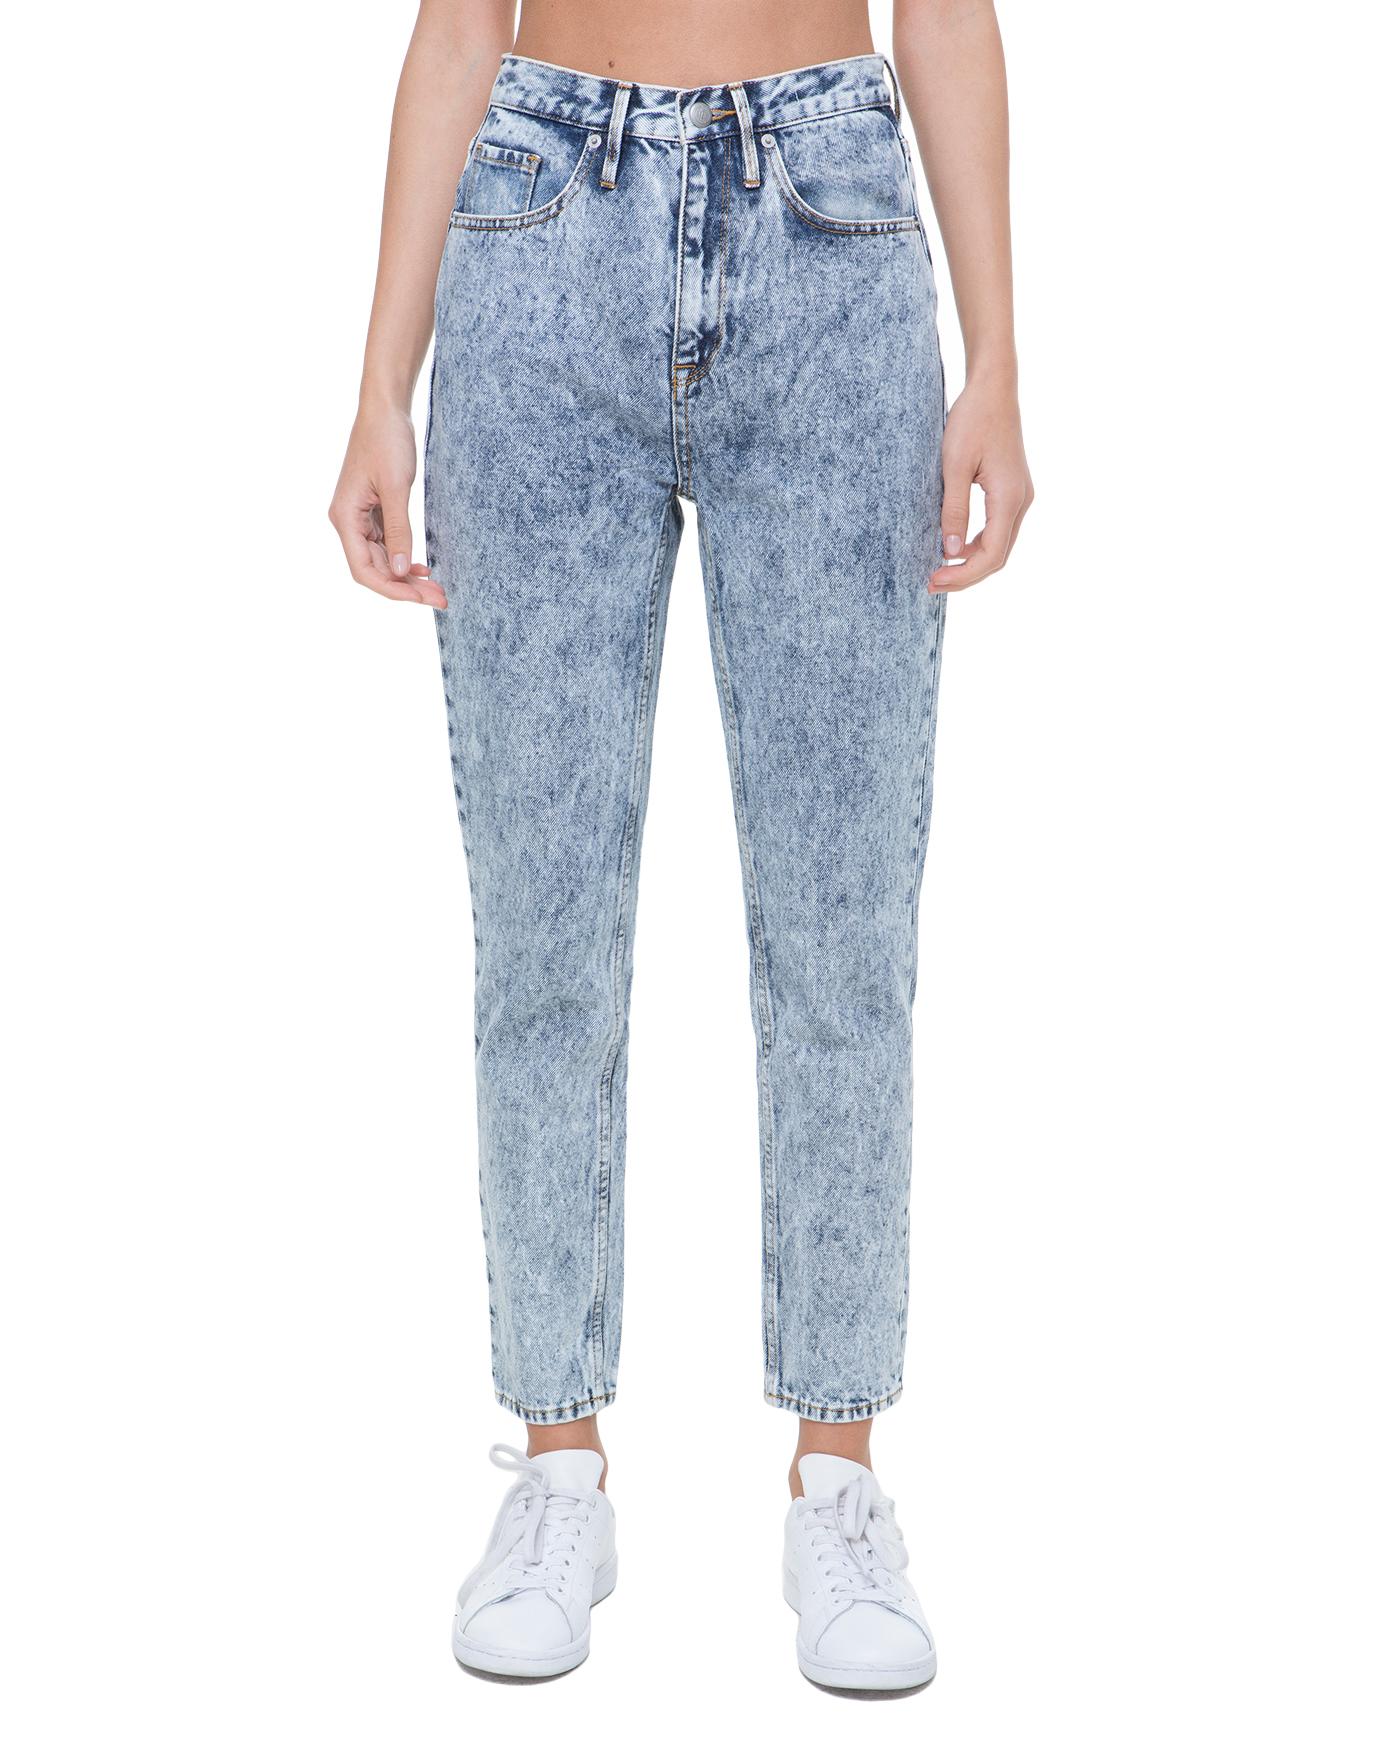 Acid wash jeans fashion 89